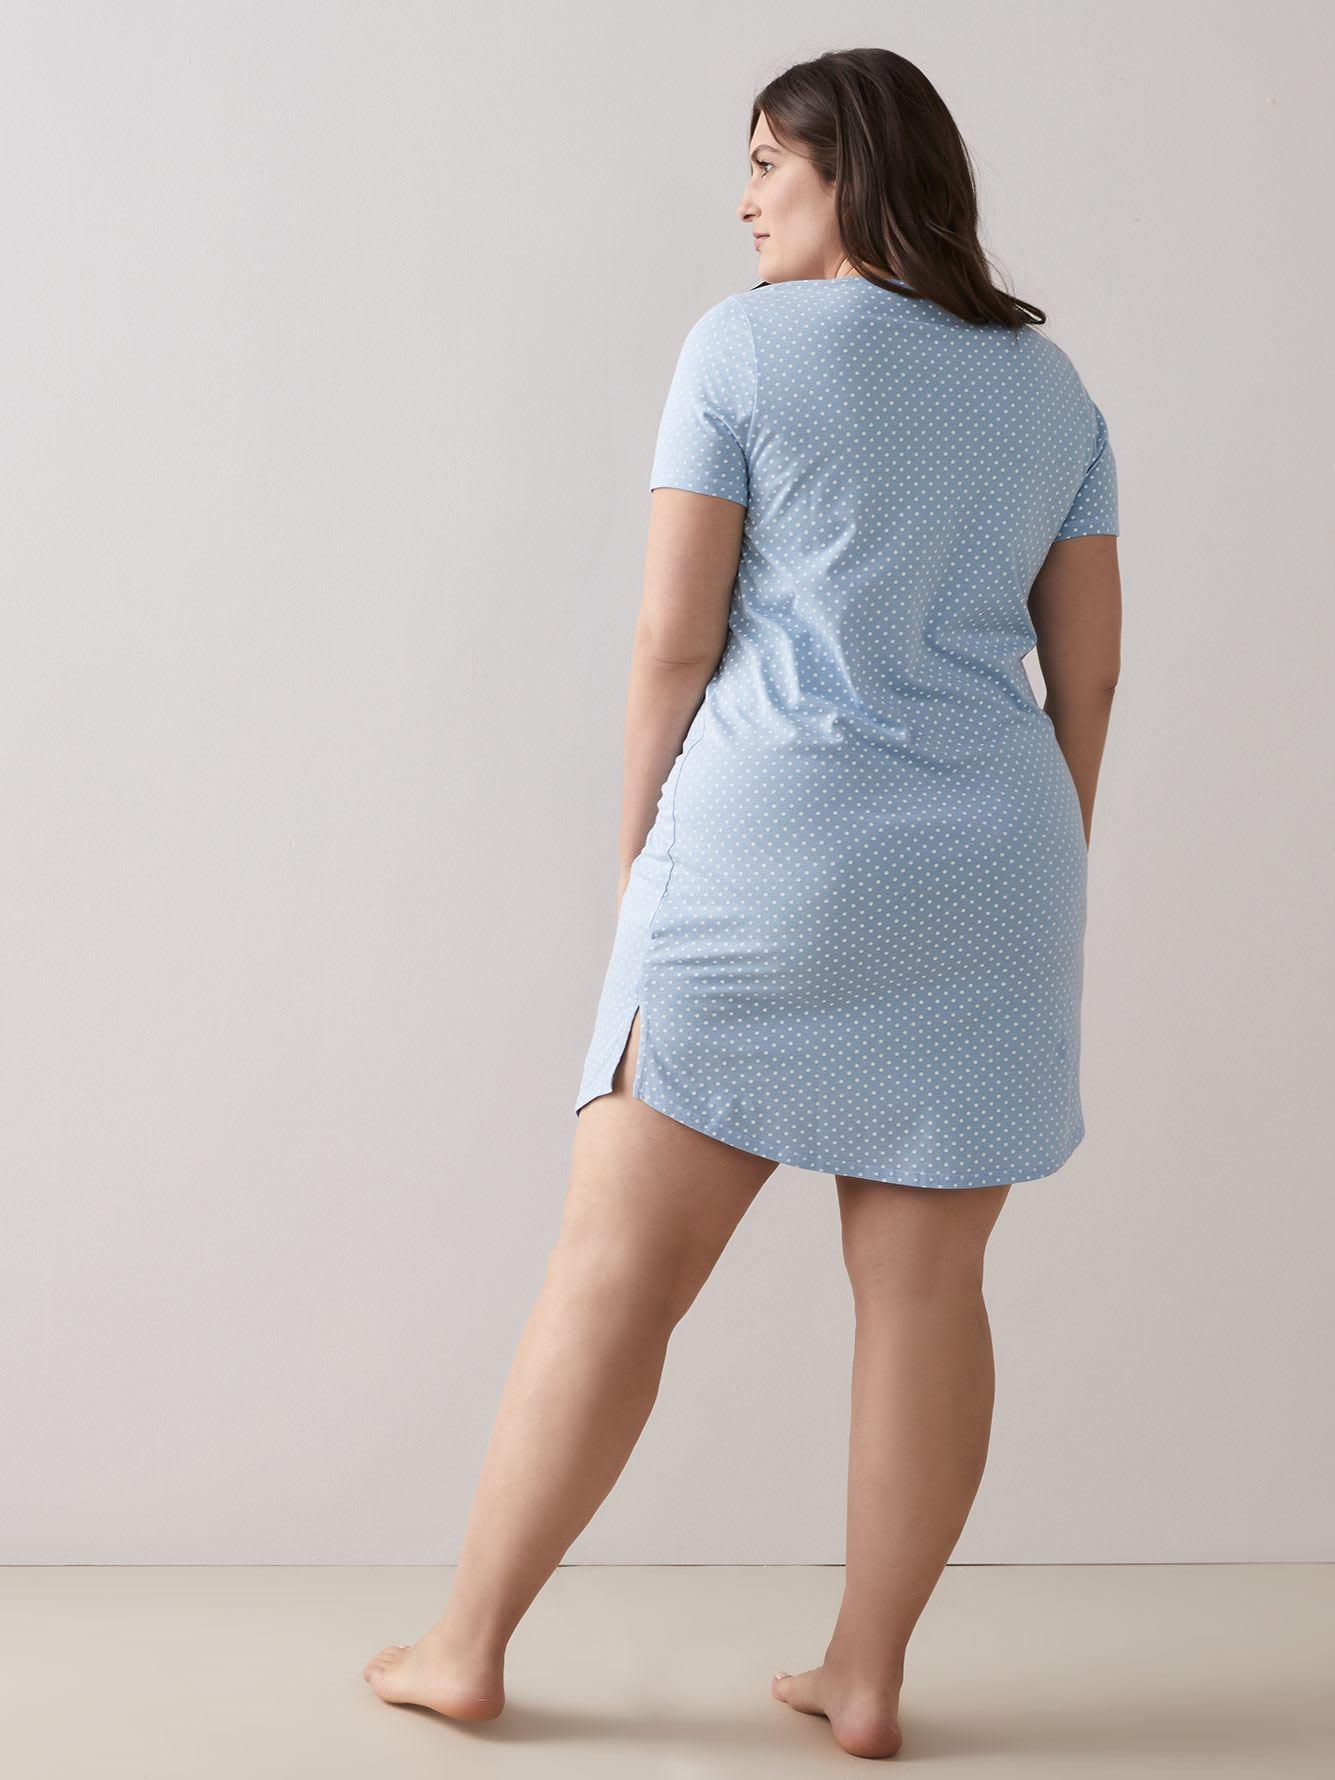 89db22deb Marled and Dotted Short Sleeve Sleepshirt - ti Voglio